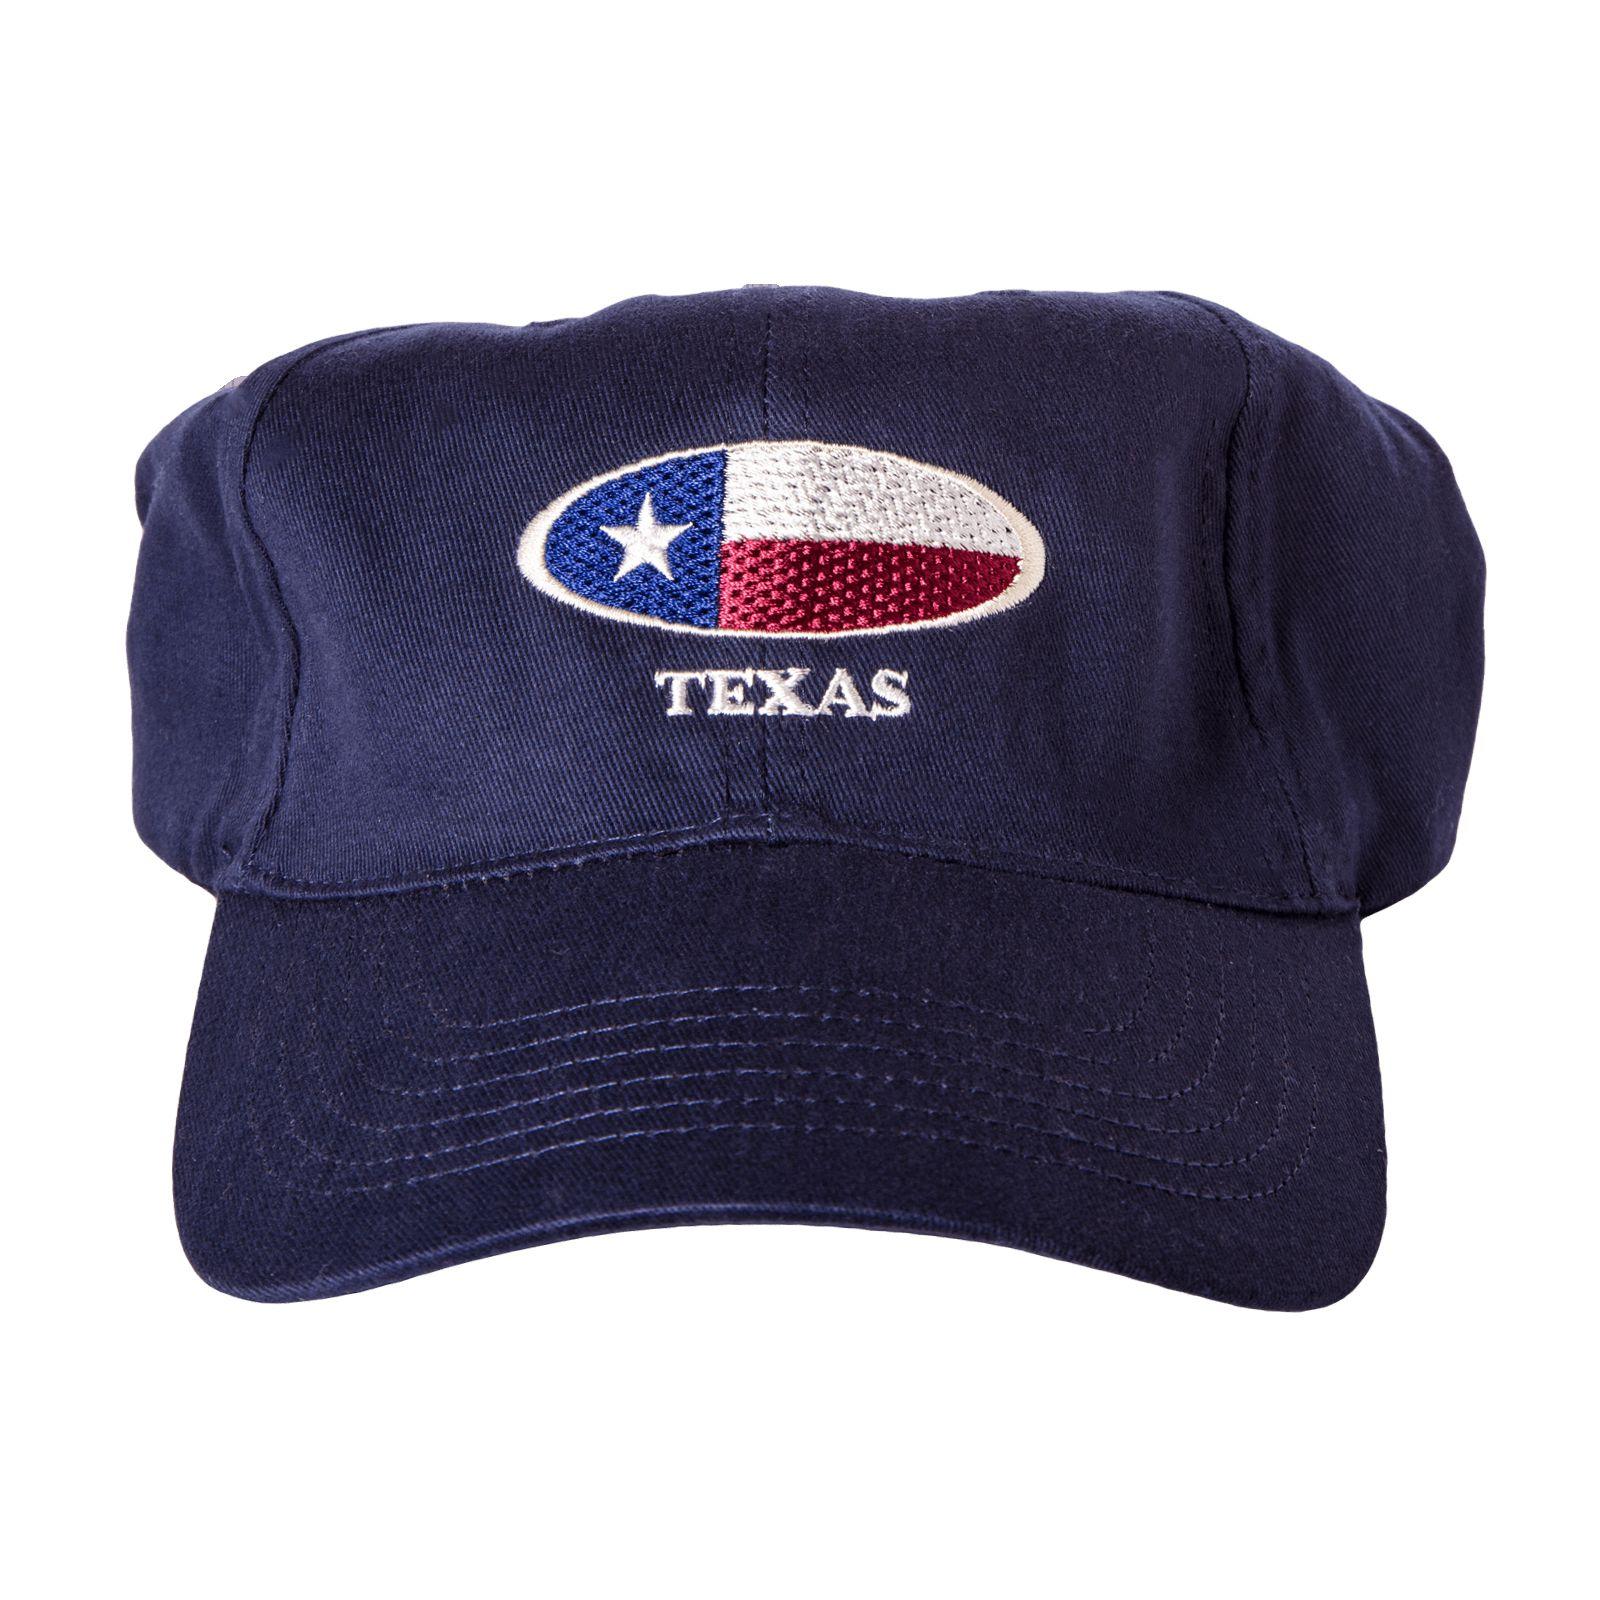 f55ff9da9 ... closeout oval texas flag baseball cap 907b7 e99fd